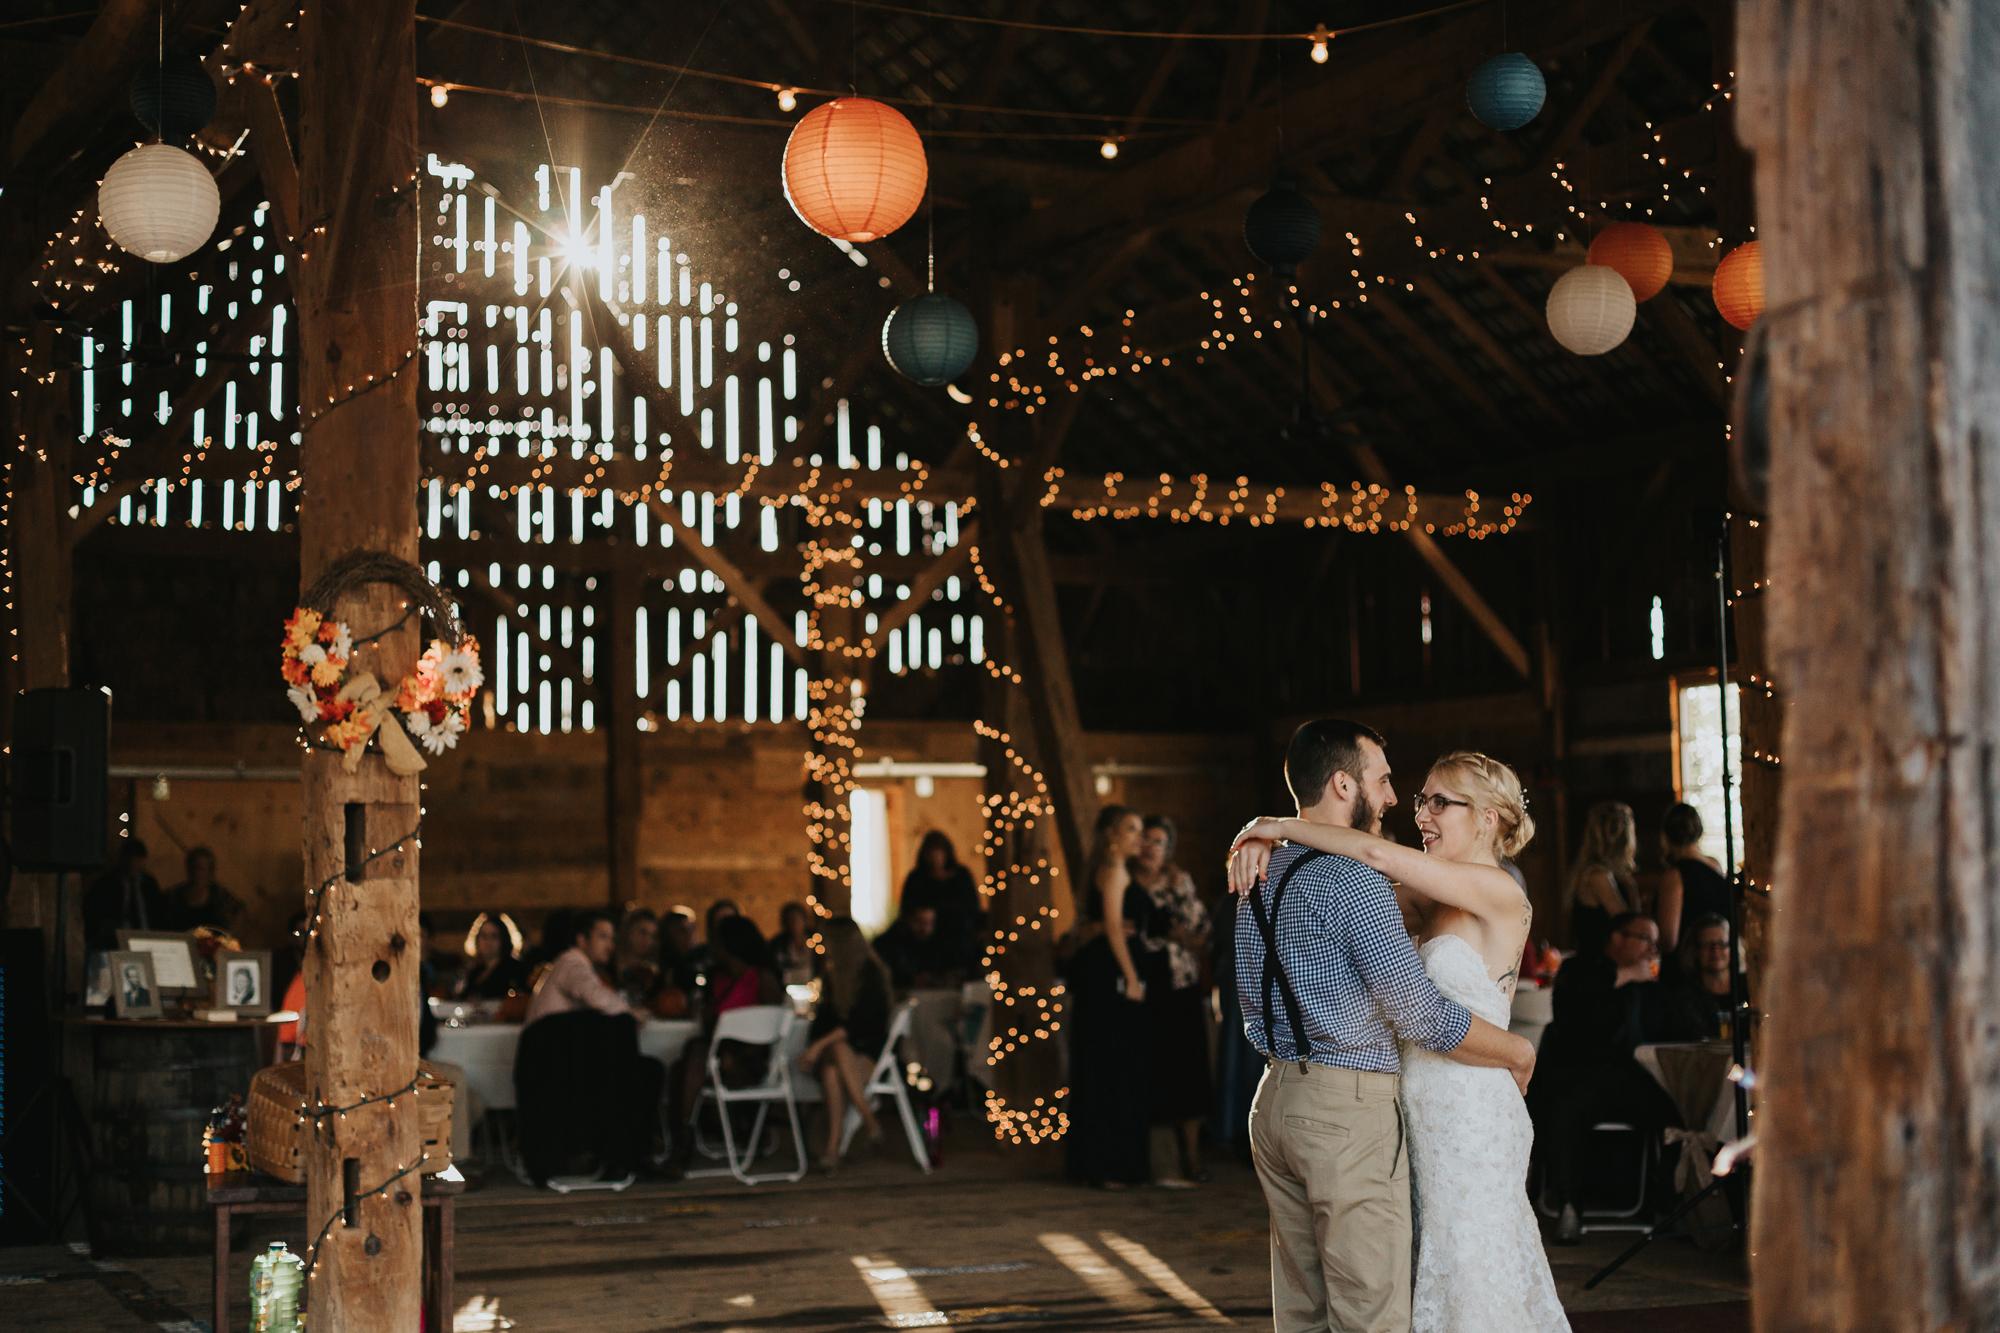 first-dance-in-golden-light-barn-farm-at-beeber-drive-pennsylvania